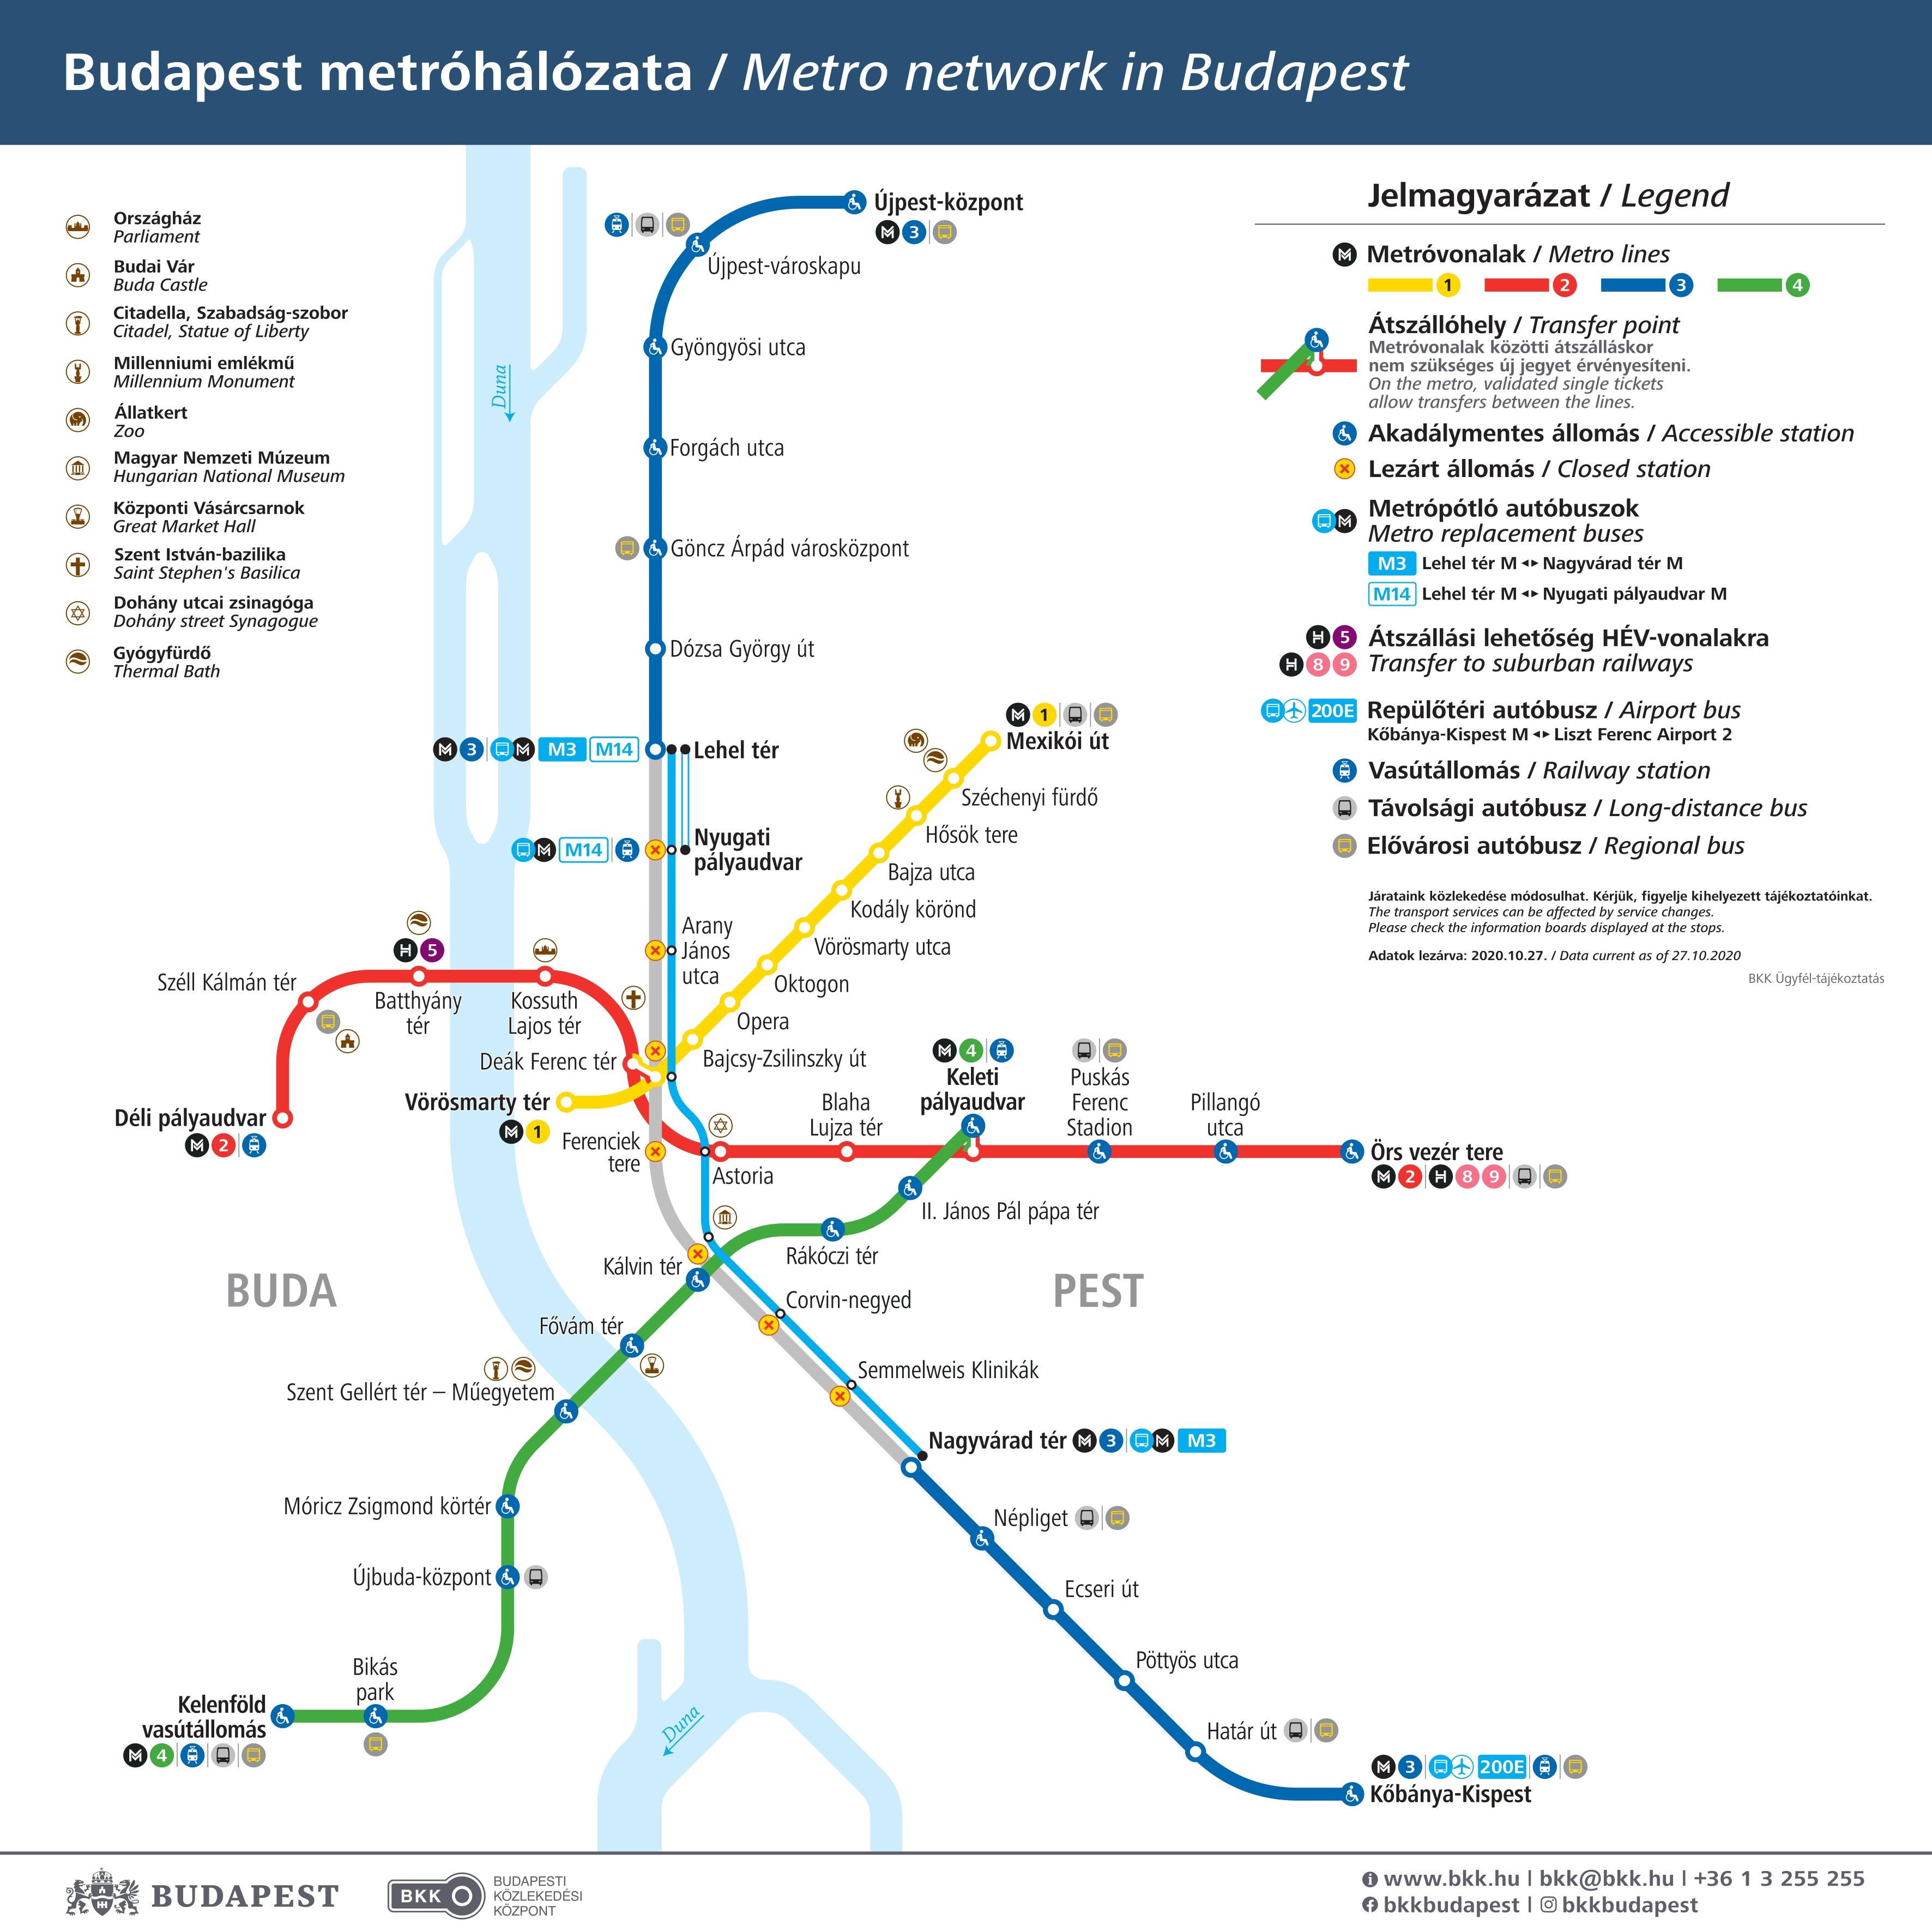 Карта метро Будапешта с ограничениями М3